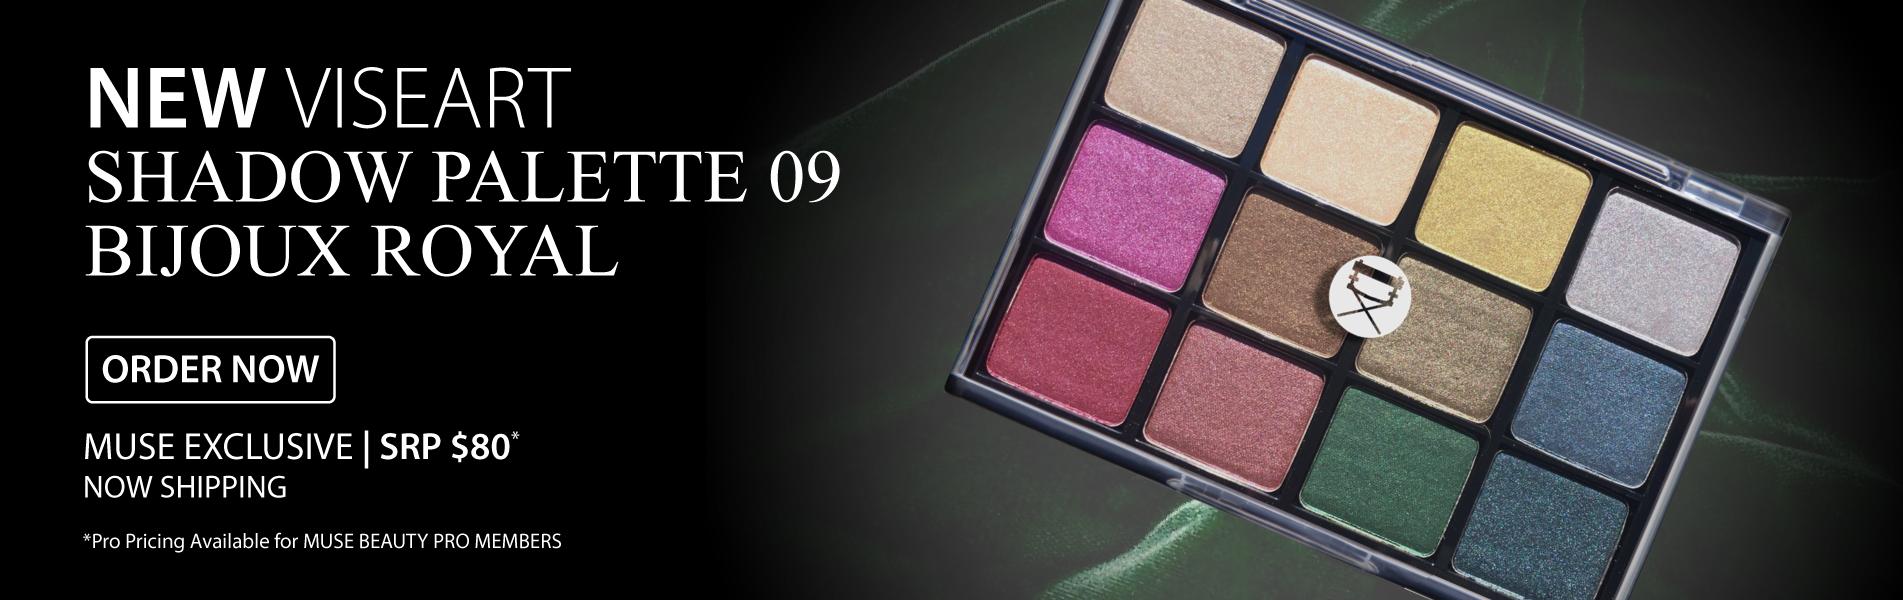 Viseart Bijoux Royal Shadow Palette